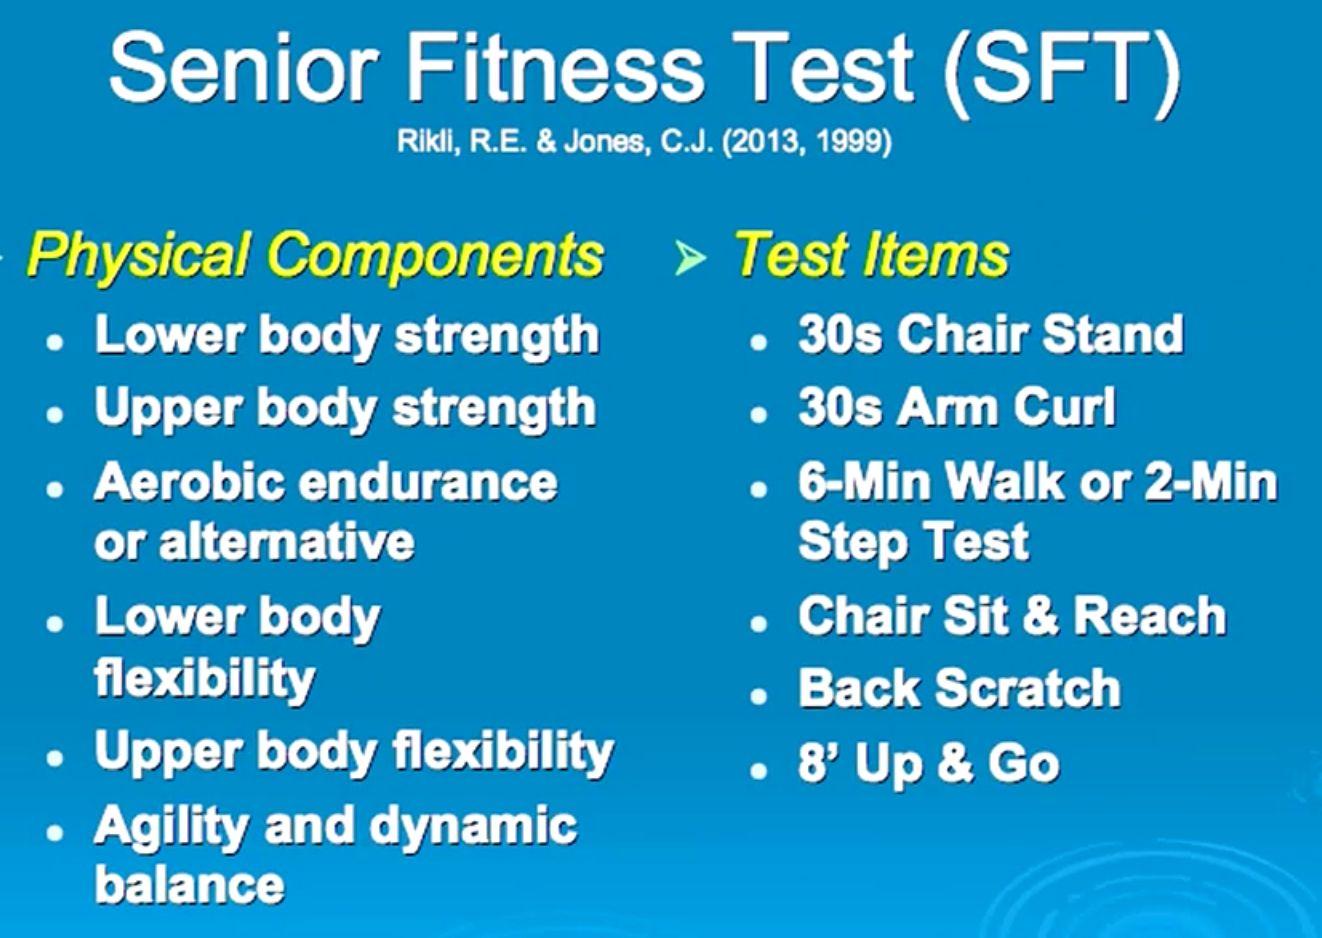 Pin by Tammy on Senior Fitness Info    Senior fitness, Fitness